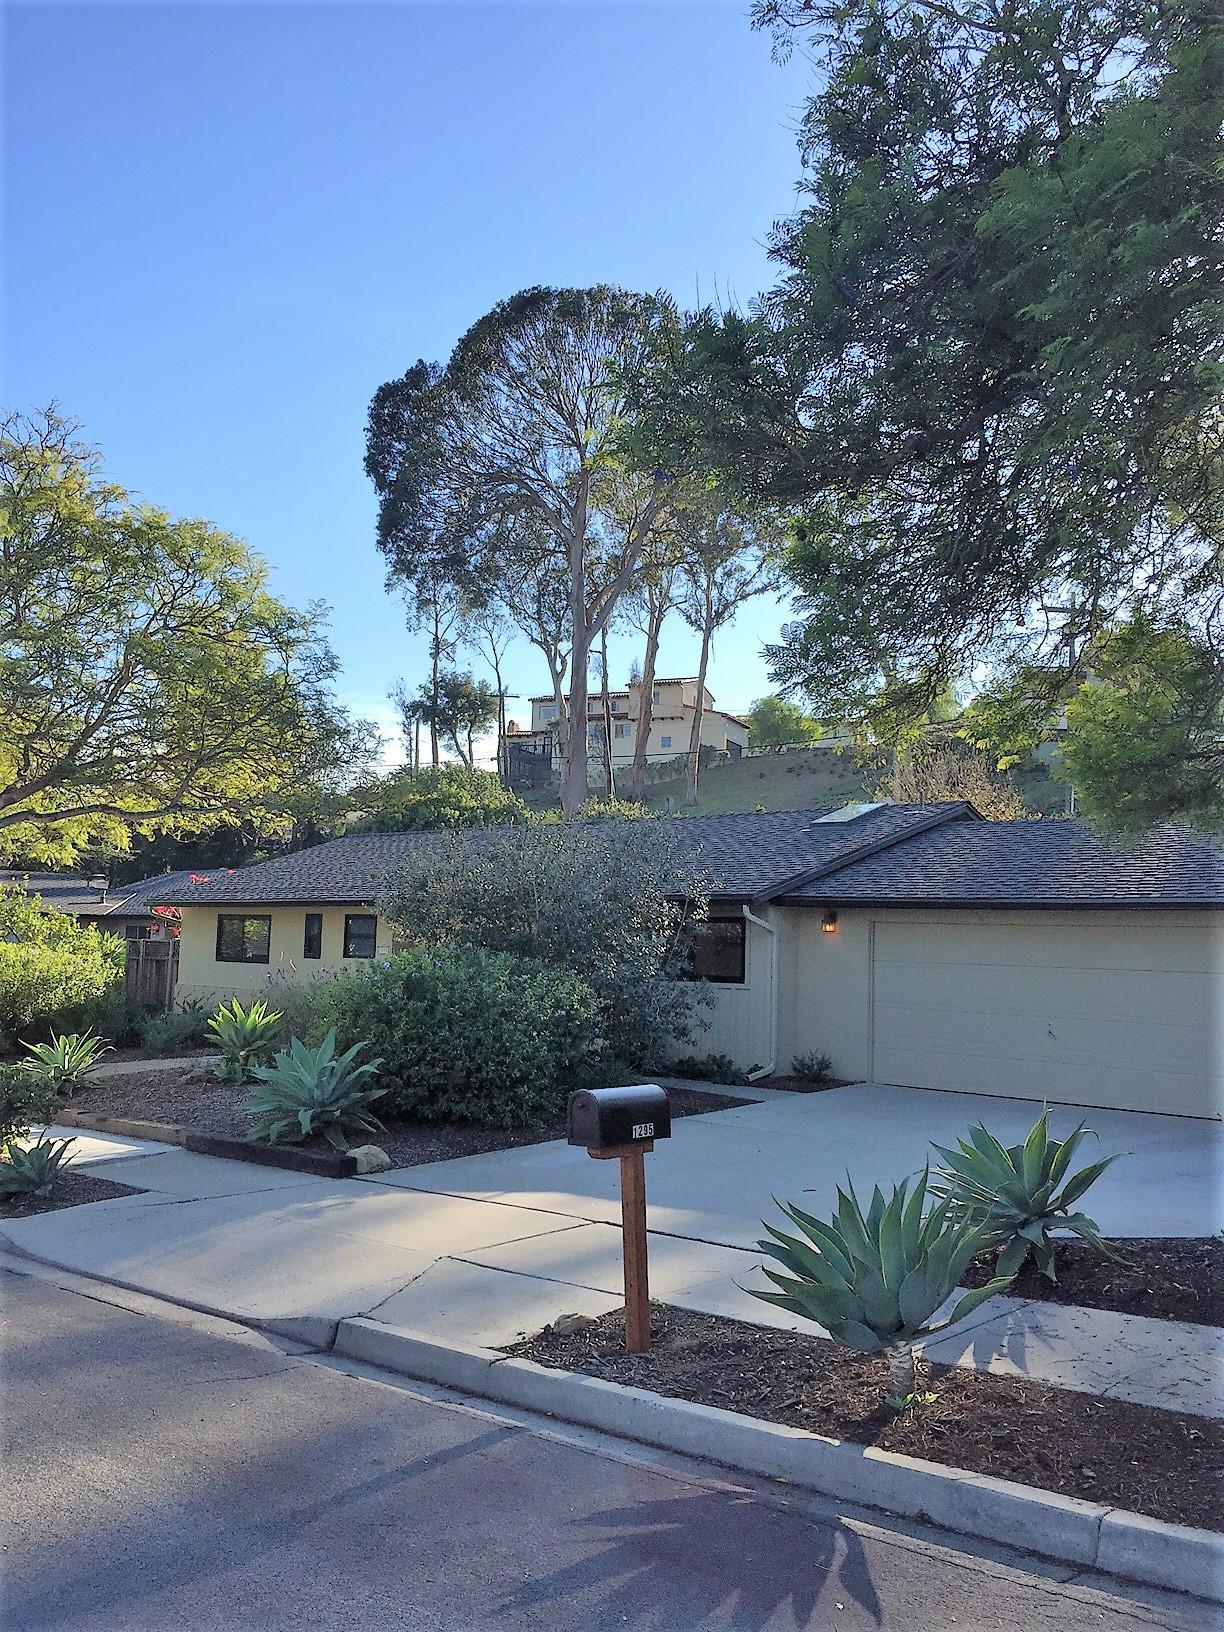 Property photo for 1295 Kenwood Rd Santa Barbara, California 93109 - 16-3813